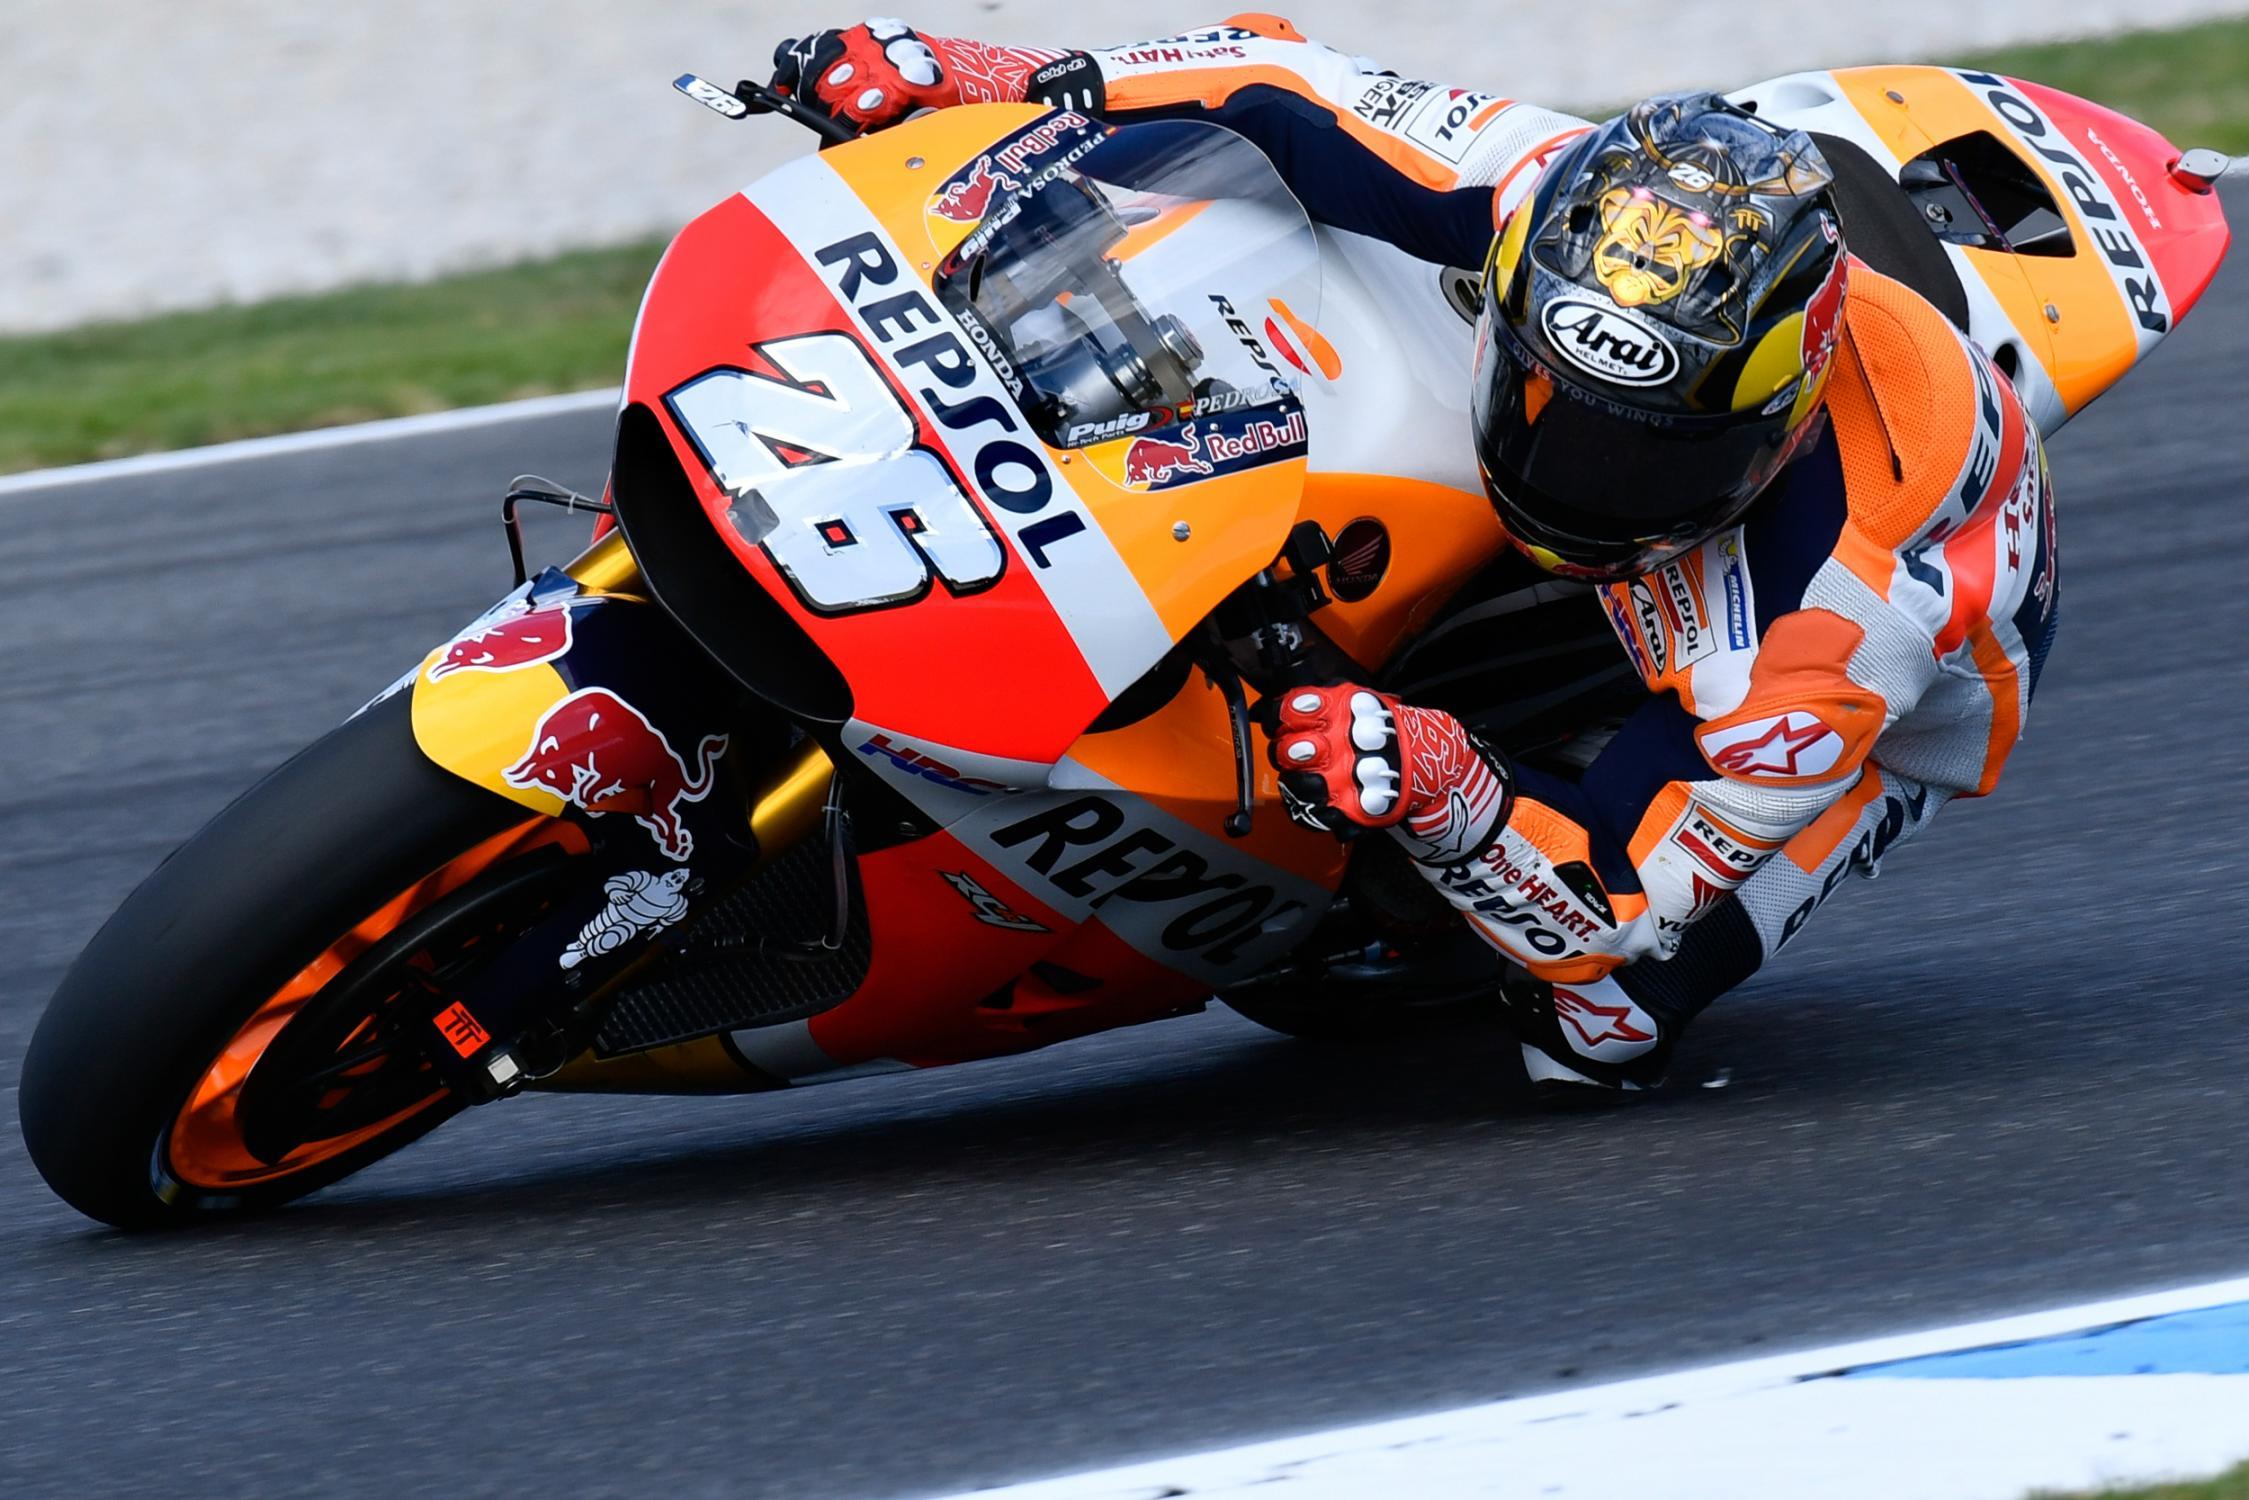 [MotoGP] Test Phillip Island 26-dani-pedrosa-esp_br10438.gallery_full_top_fullscreen